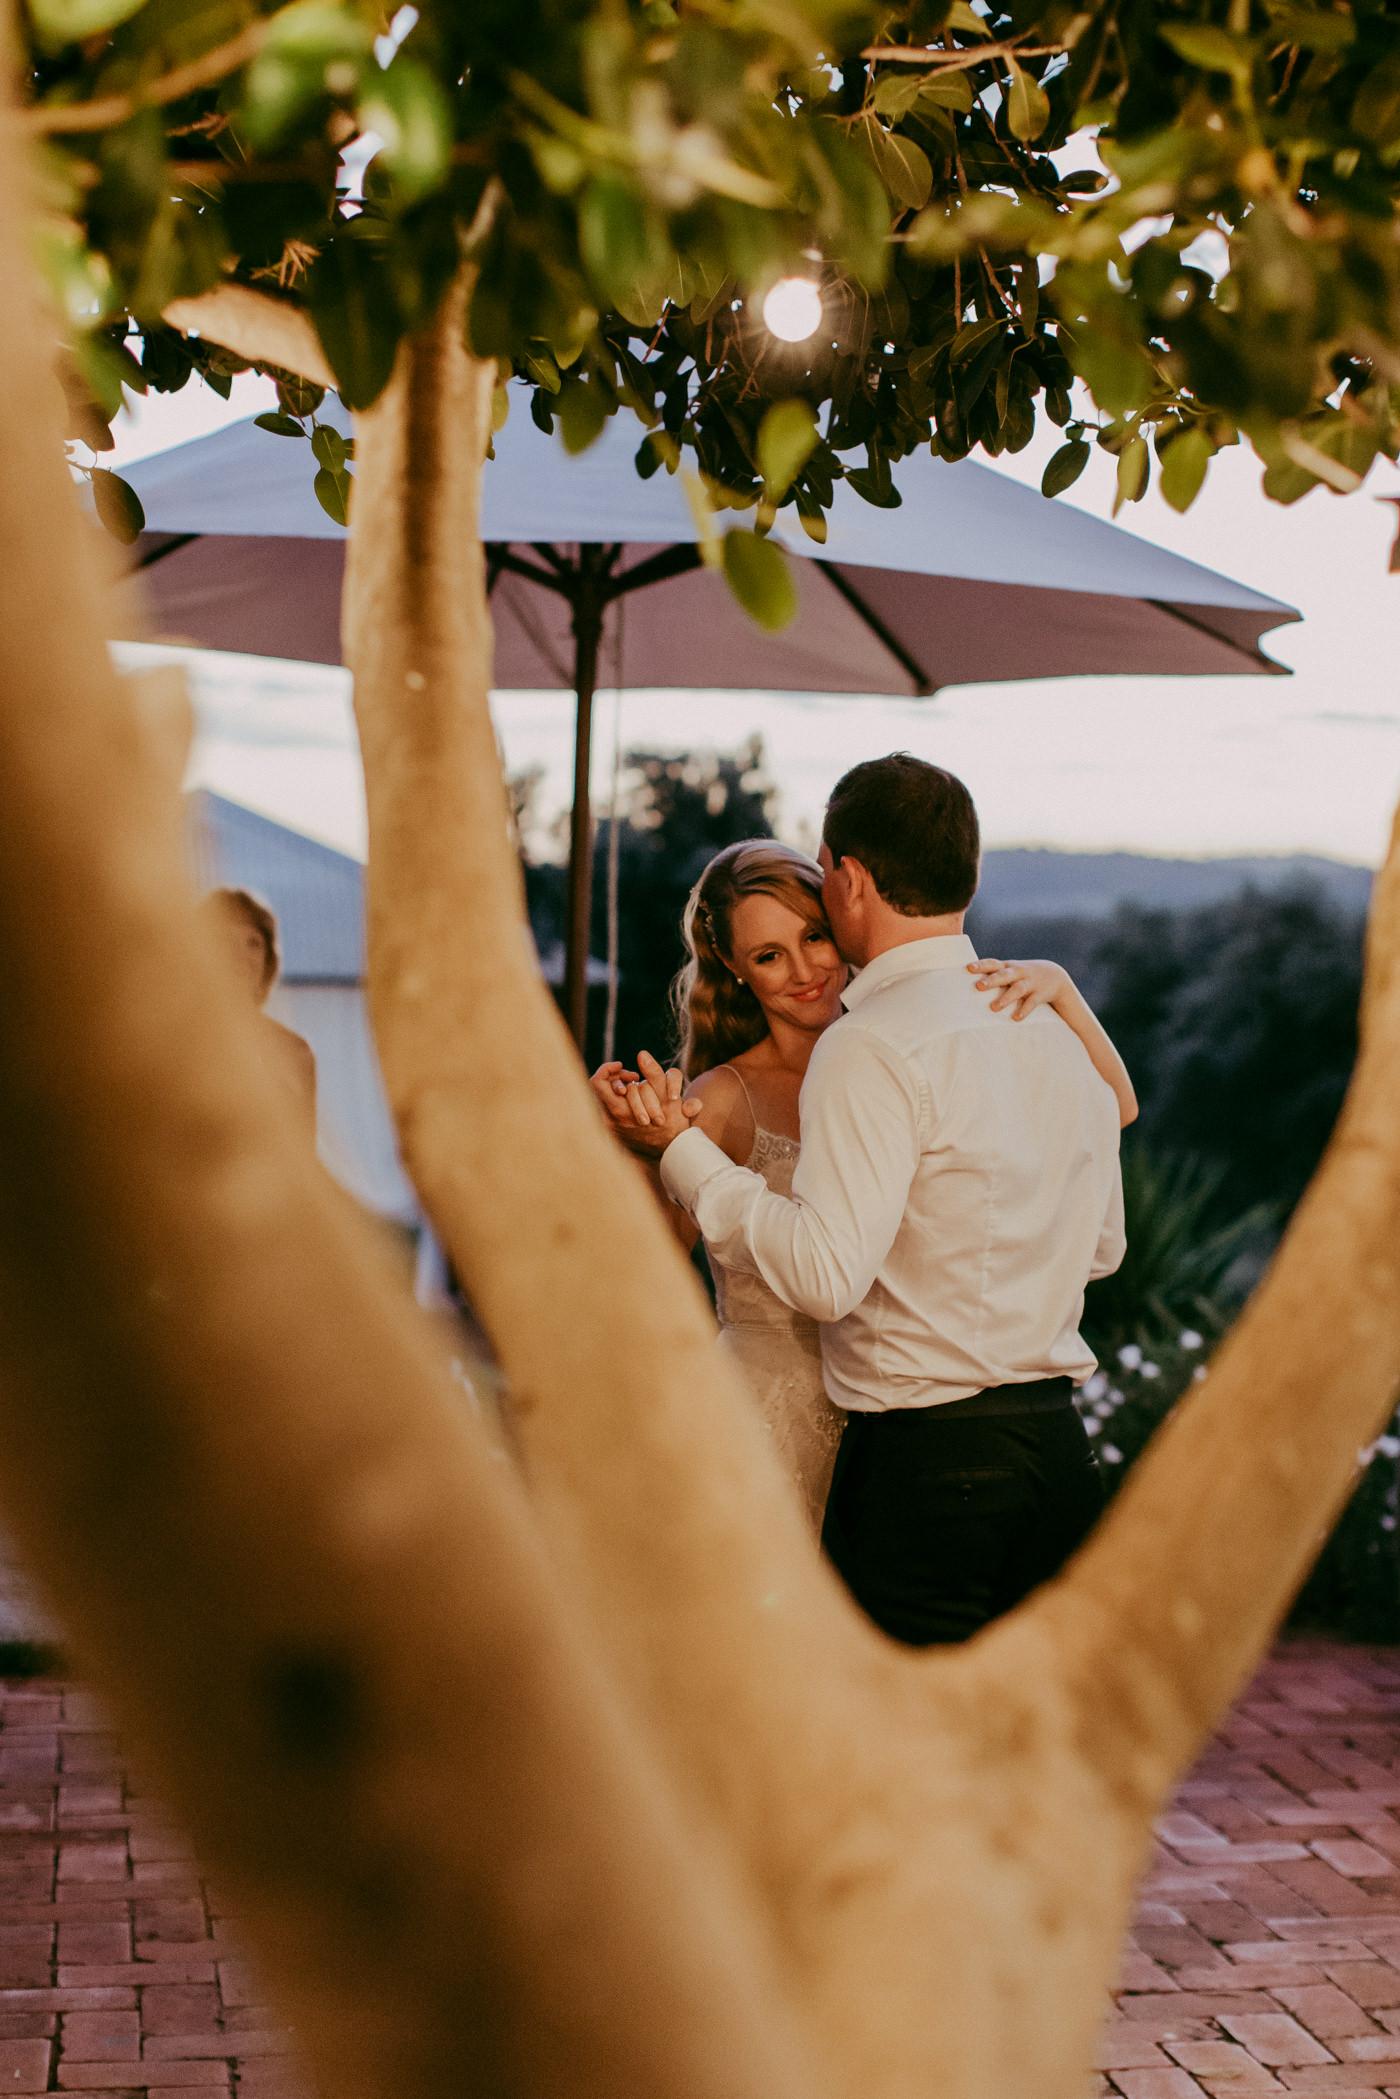 Anthony & Eliet - Wagga Wagga Wedding - Country NSW - Samantha Heather Photography-171.jpg